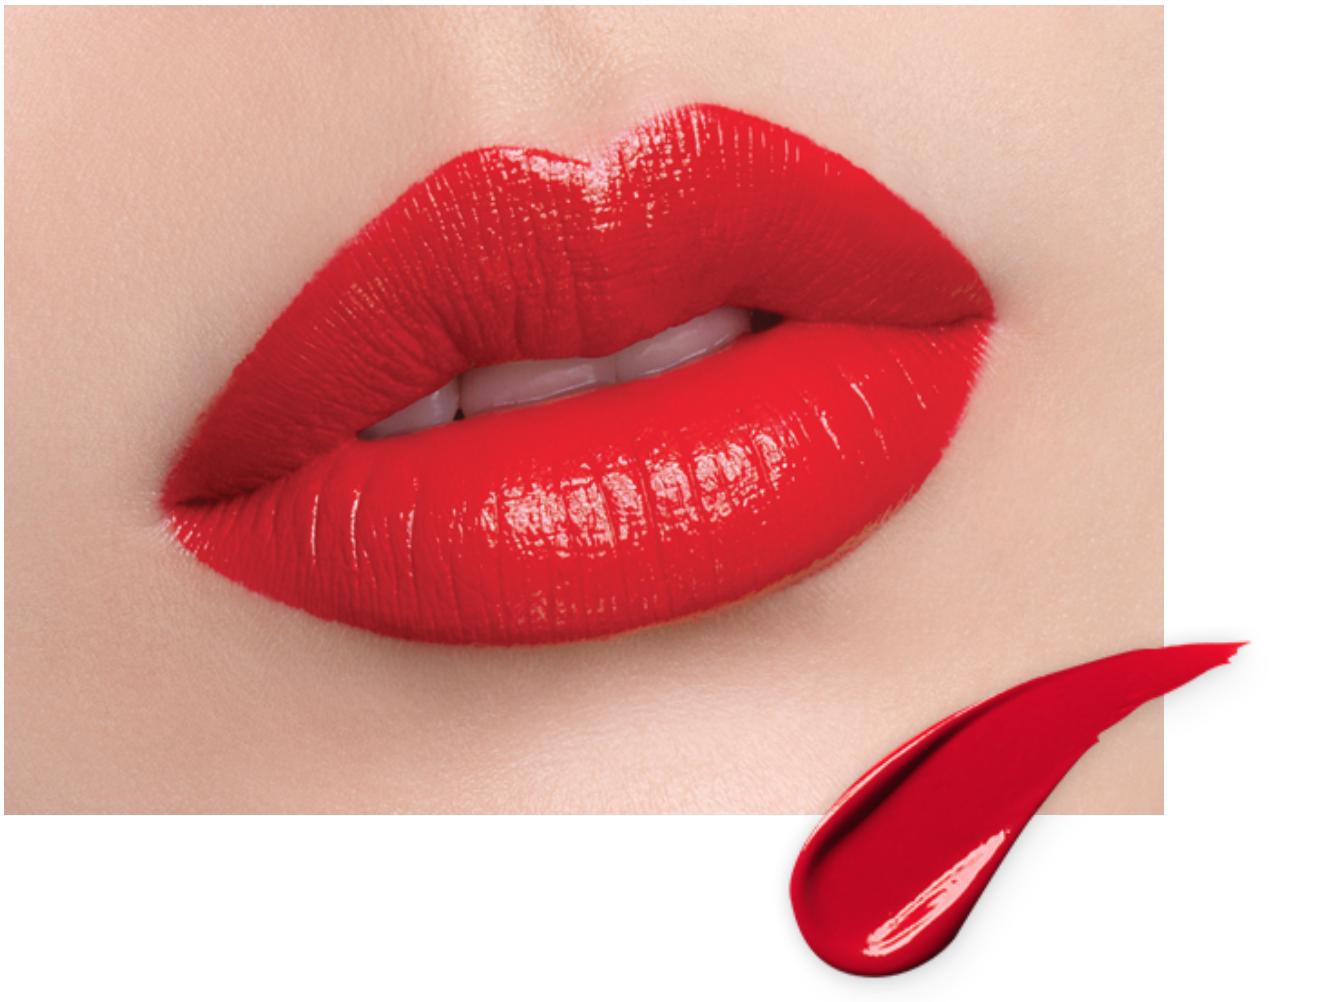 laneige-silk-intense-lipstick-330.png